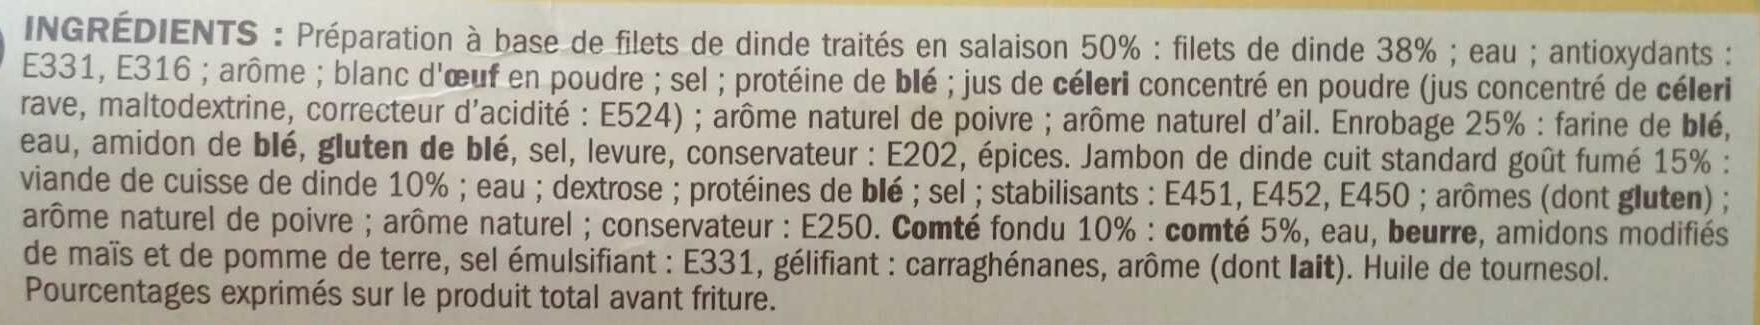 Escalopes cordon bleu comté x 2 - Ingrédients - fr